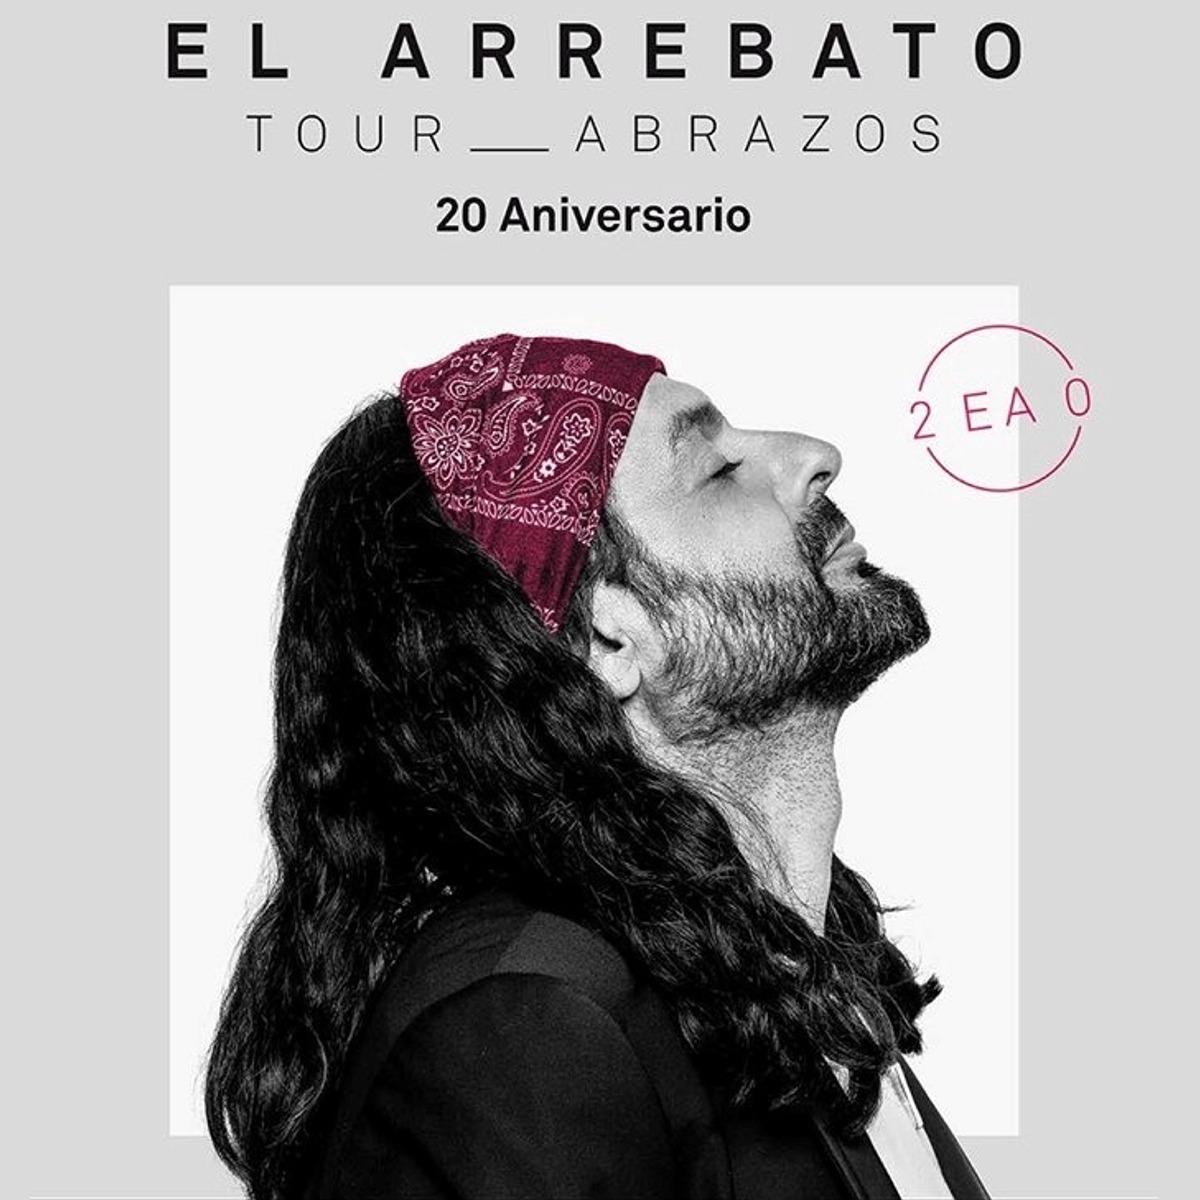 EL ARREBATO, TOUR ABRAZOS Pandora Concert - Salamanca